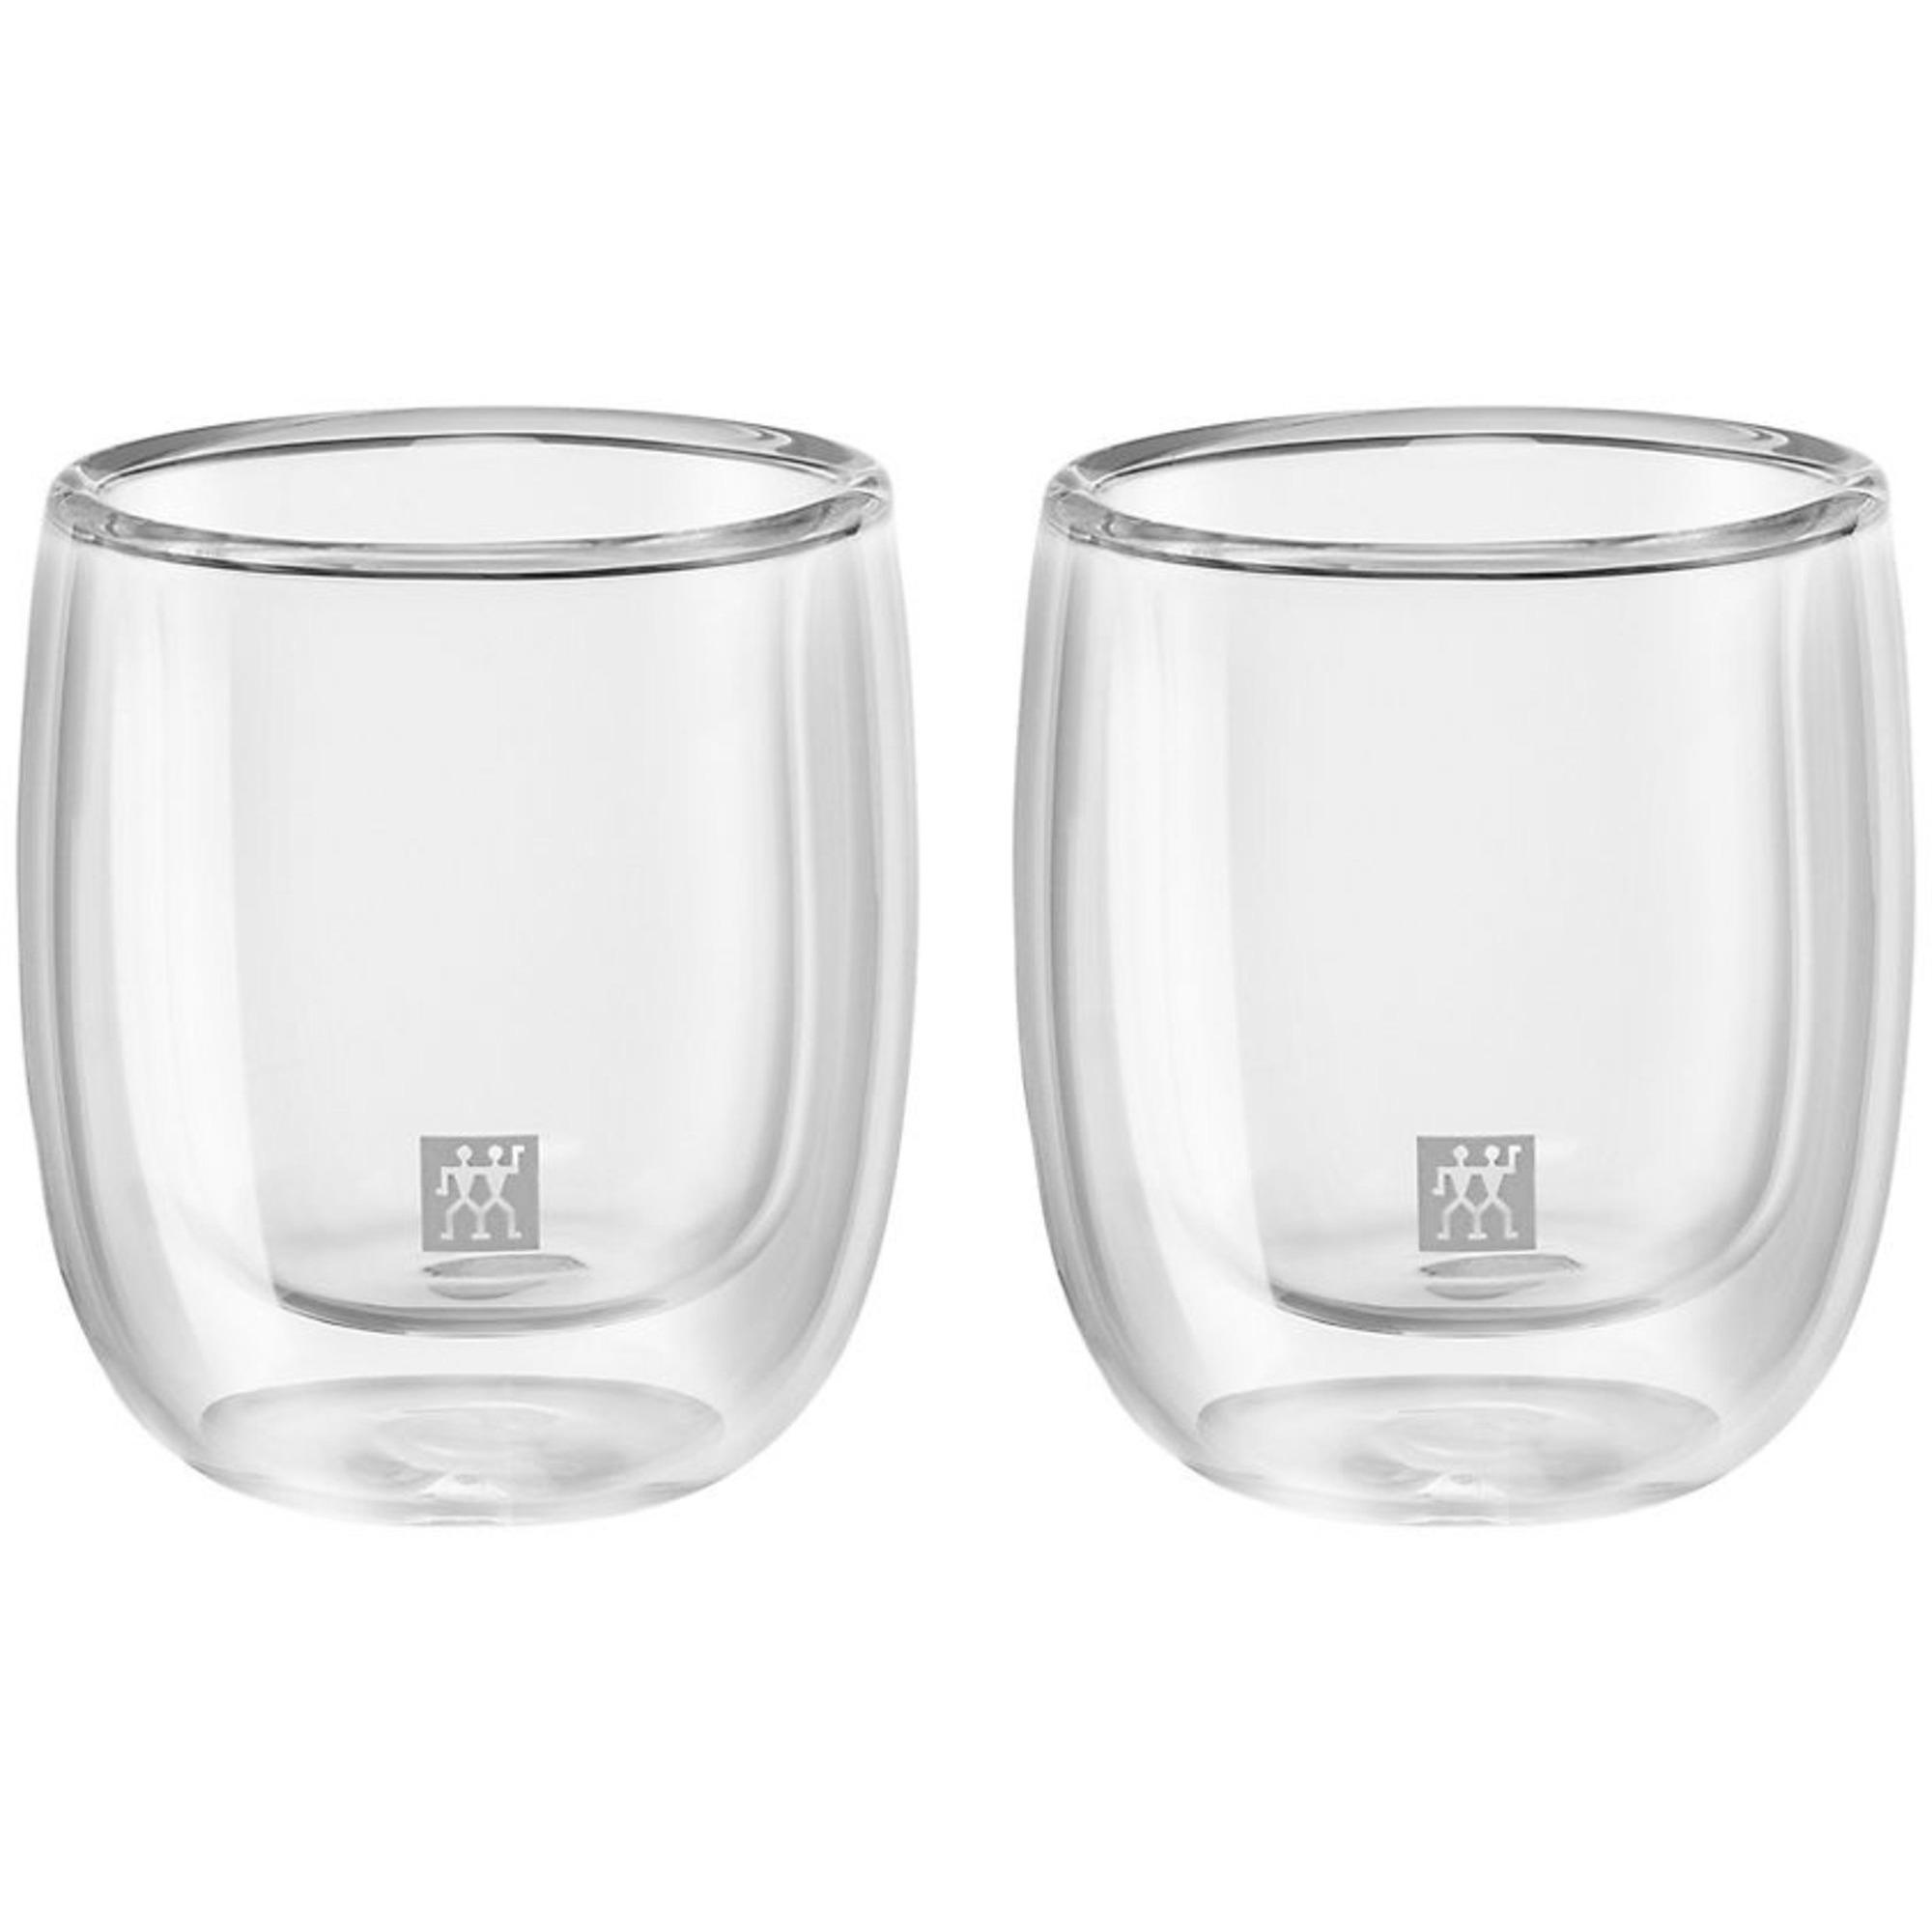 Zwilling Sorrento Espresso Glas 2 pack 80 ml